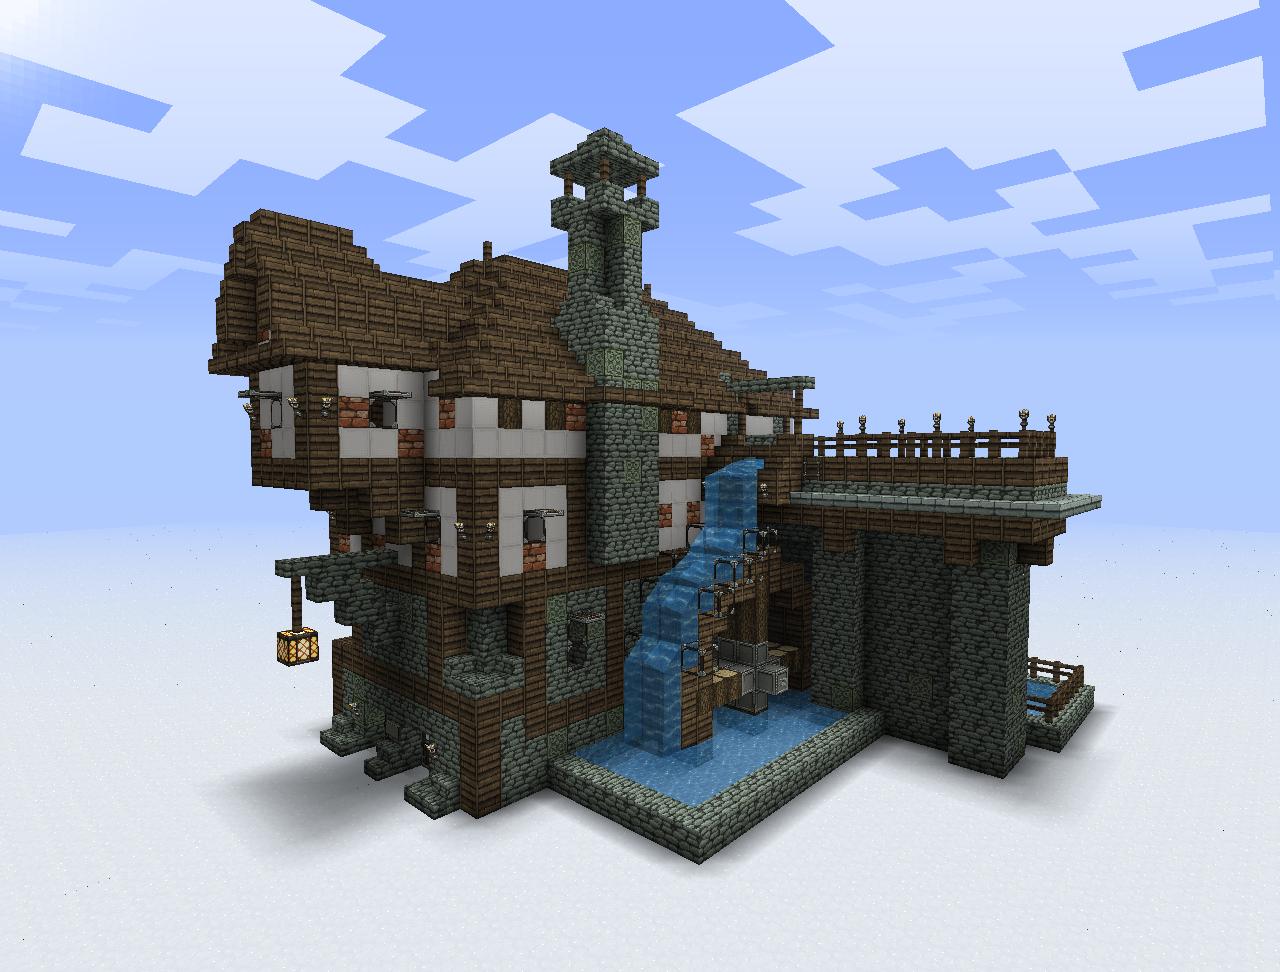 Medieval Minecraft House Minecraft Medieval Minecraft Blueprints Minecraft Medieval House